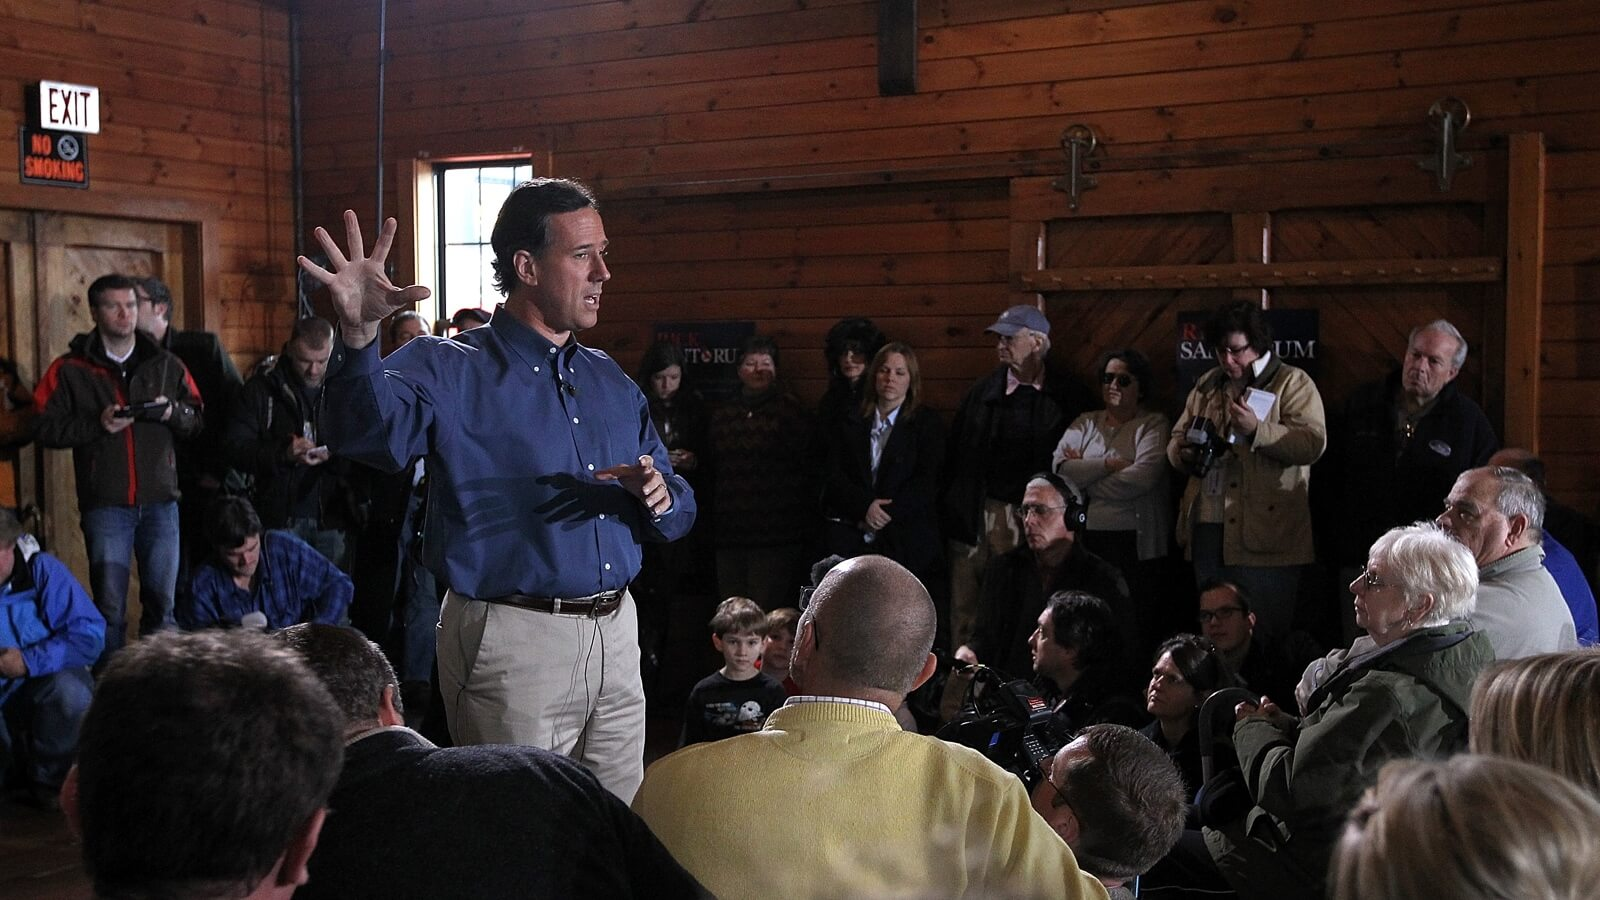 Image: Senator Santorum speaks to a crowd